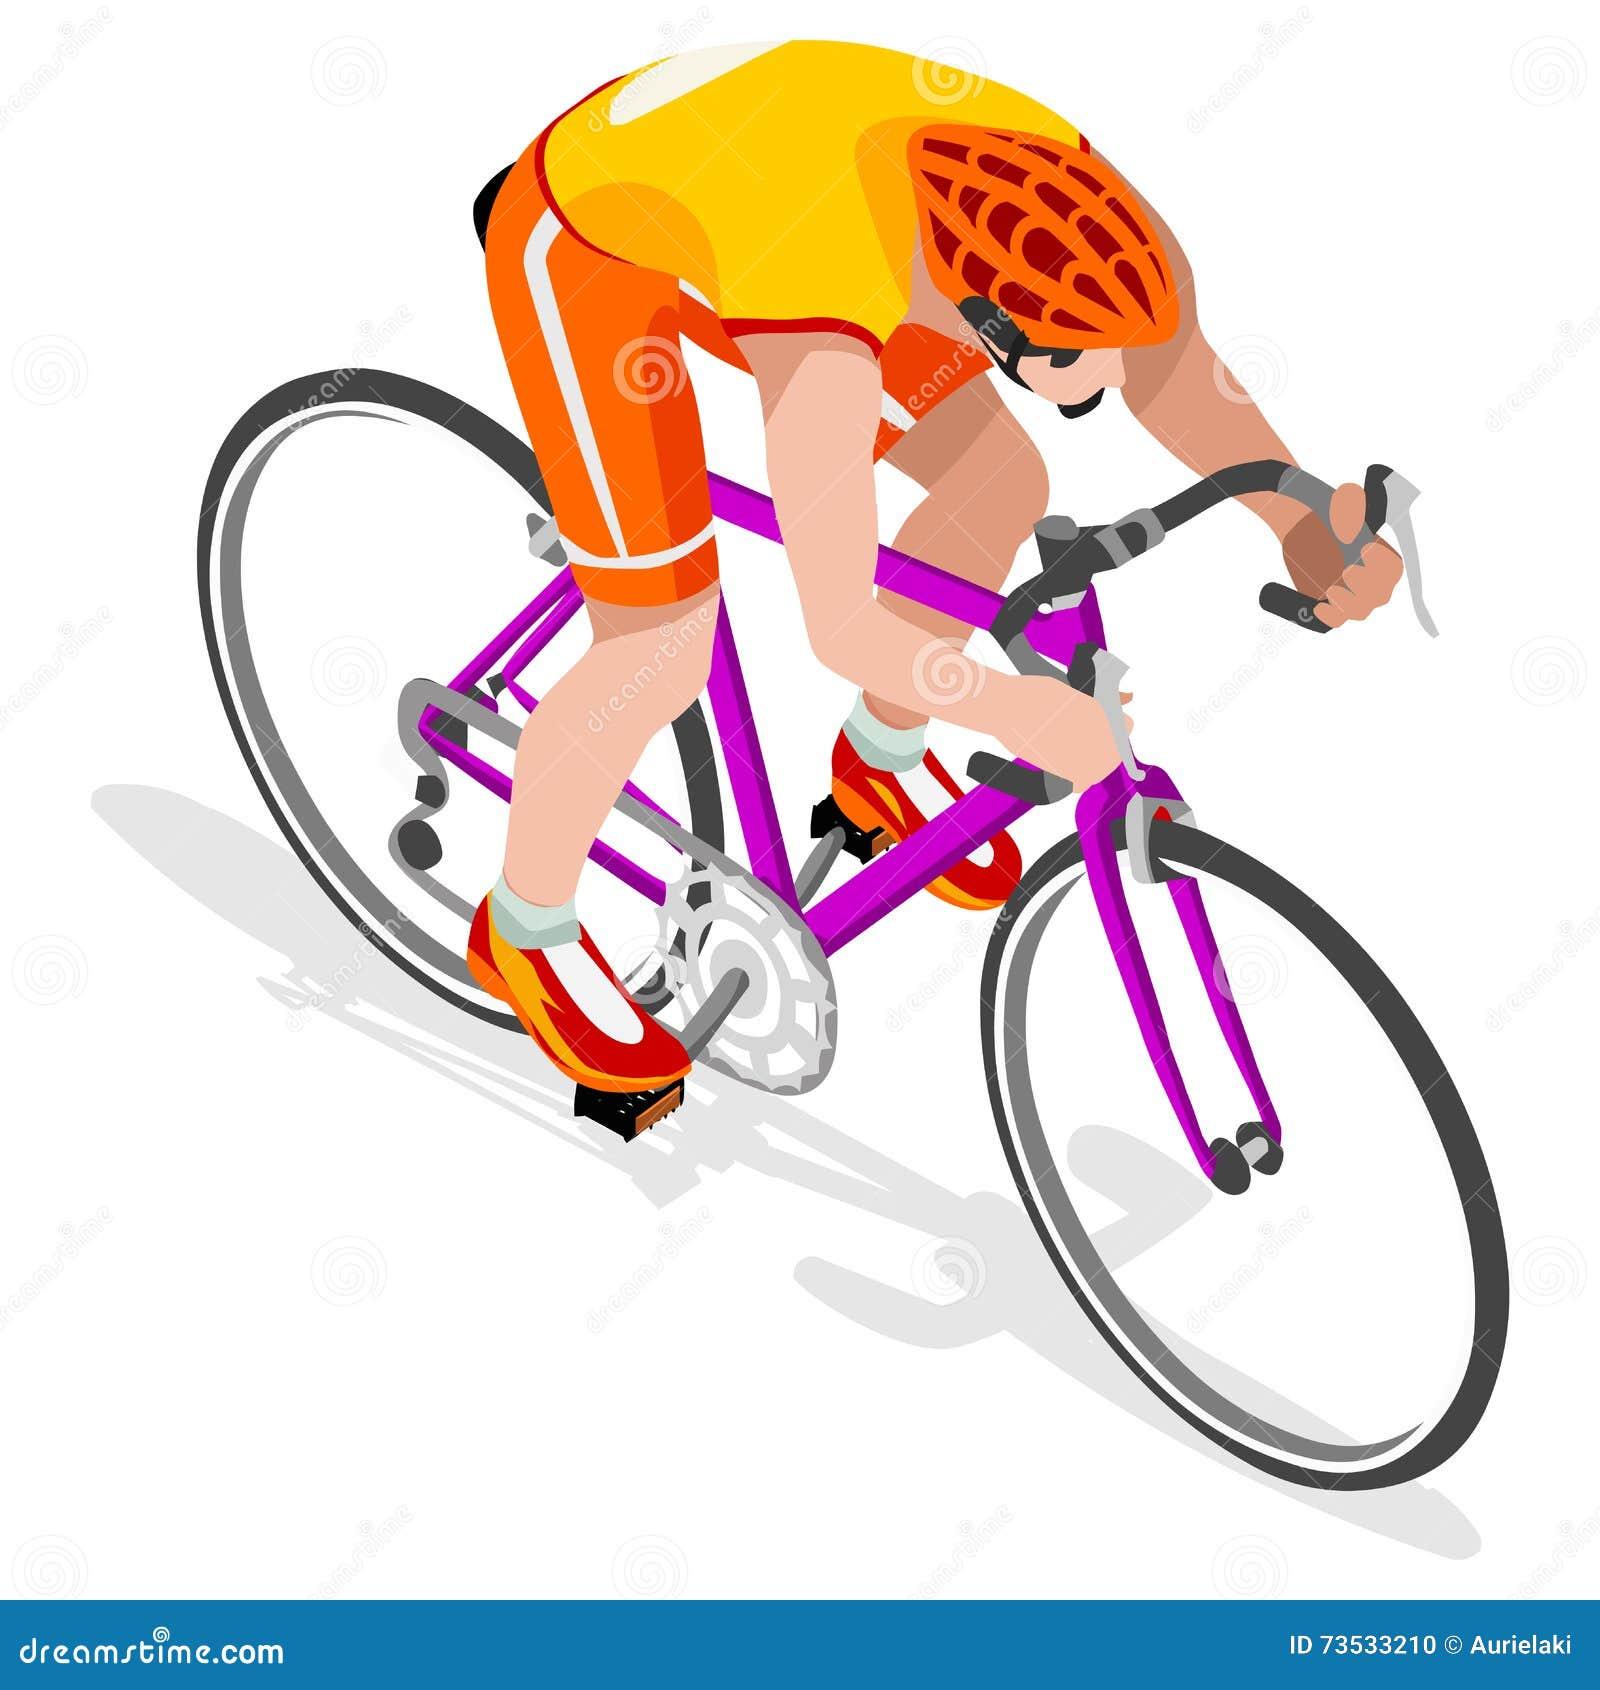 Grupo de Summer Games Icon do atleta do ciclista do ciclista da estrada Conceito da velocidade do ciclismo da estrada atleta 3D i